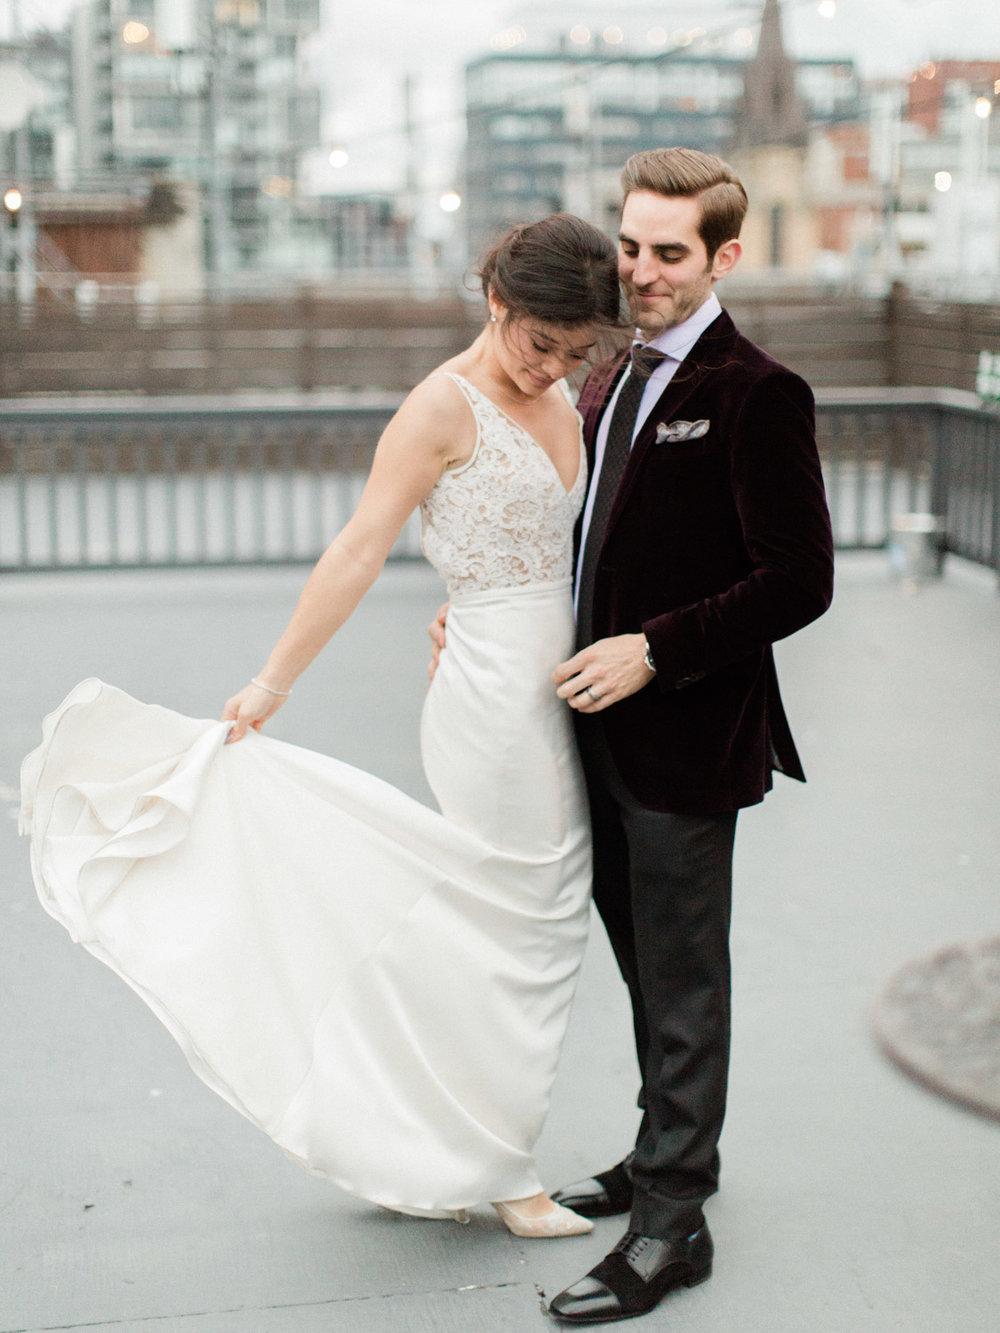 corynn-fowler-photography-toronto-collingwood-destination-wedding-photographer-690.jpg